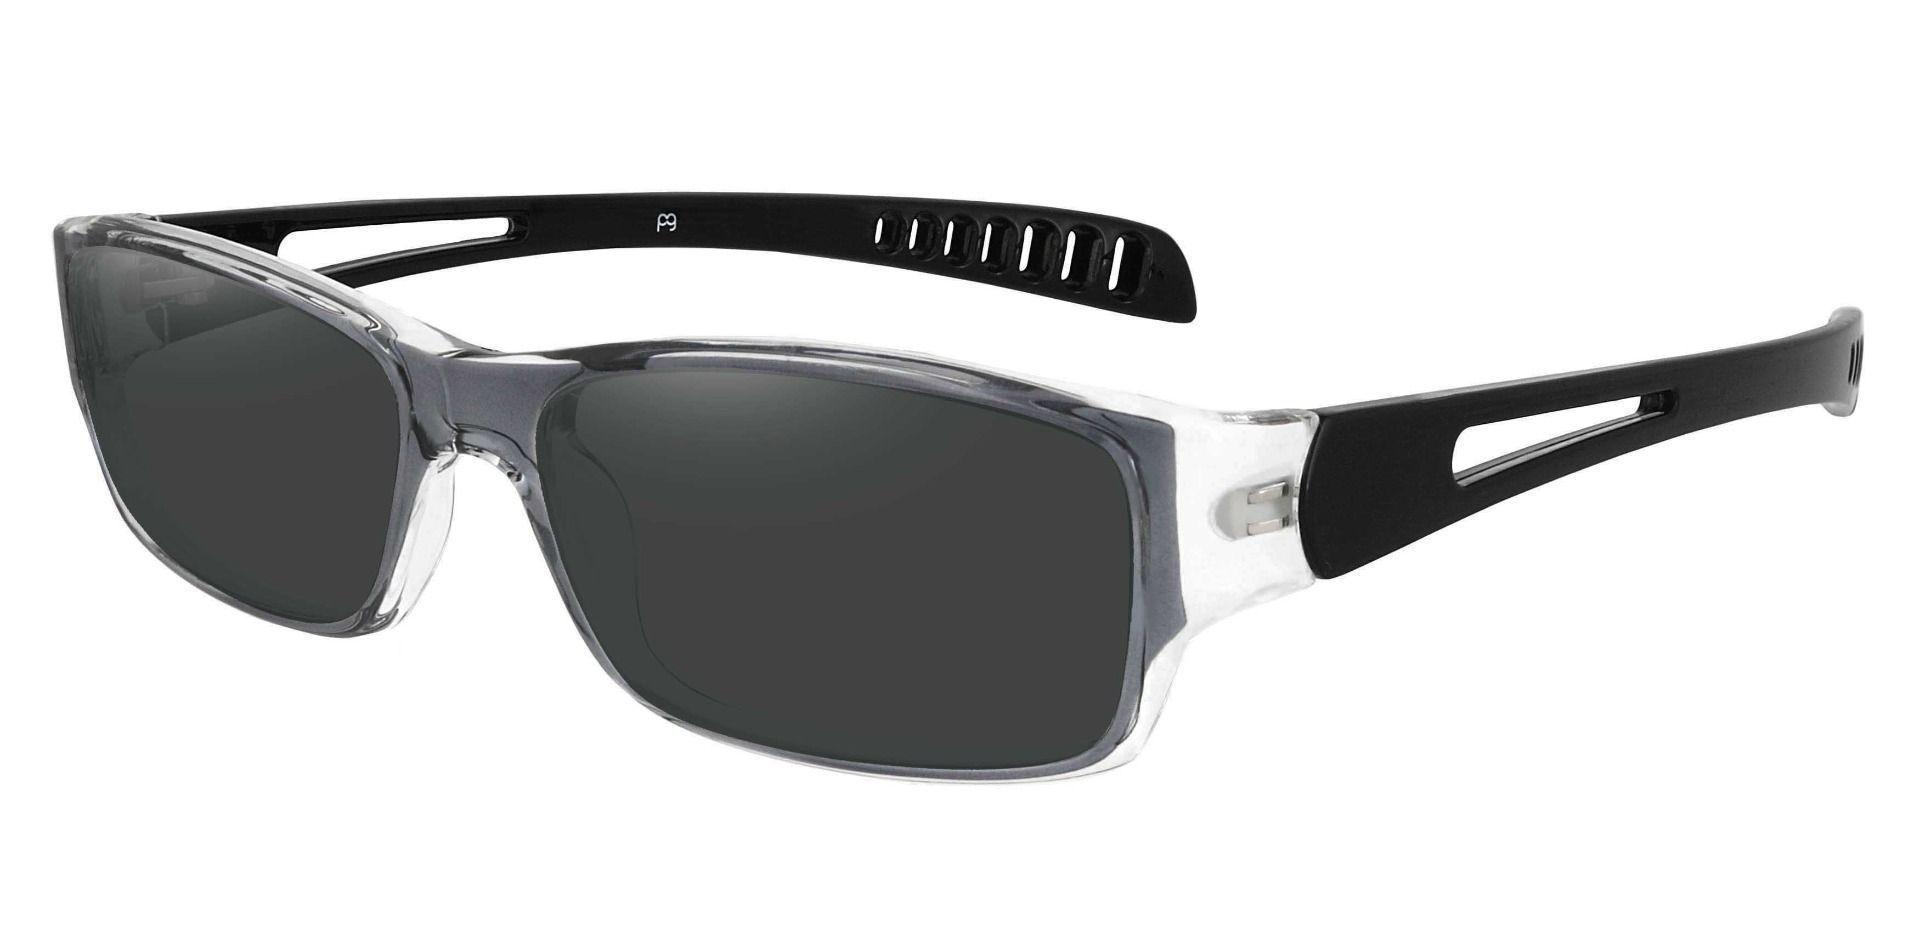 Mercury Rectangle Prescription Sunglasses - Gray Frame With Gray Lenses